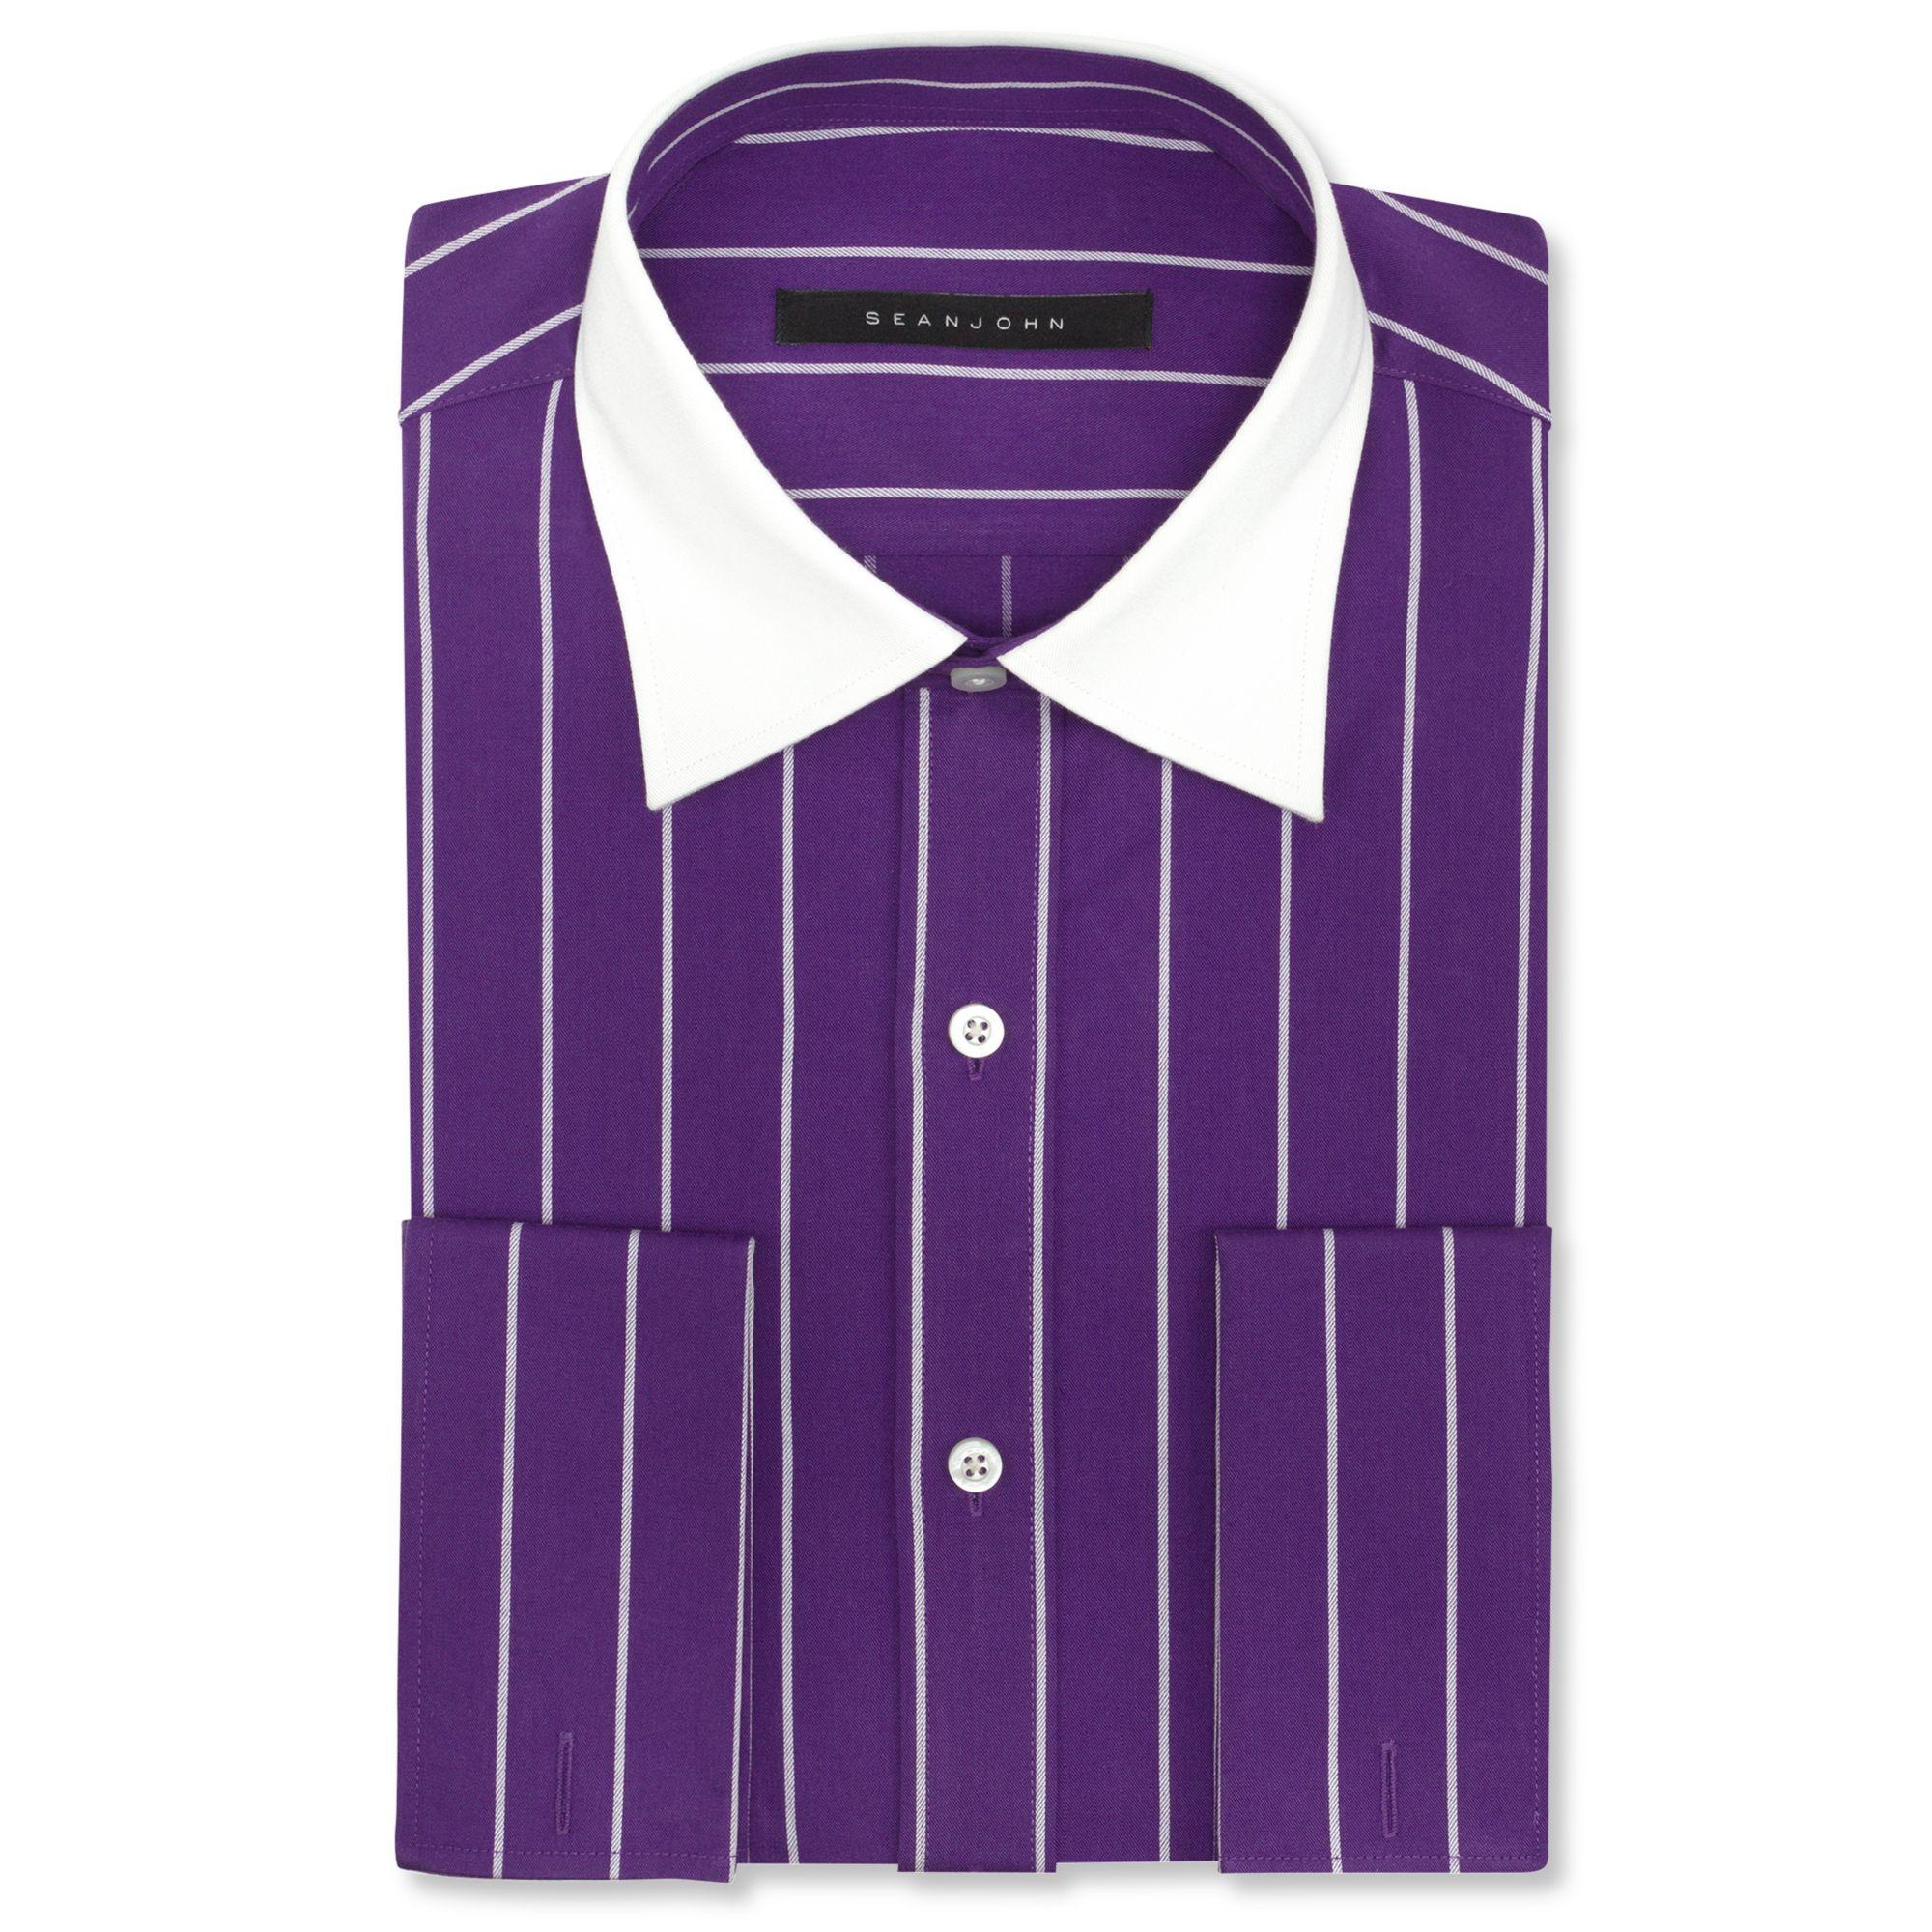 Sean john big and tall pinstripe french cuff shirt in for Big and tall french cuff dress shirts